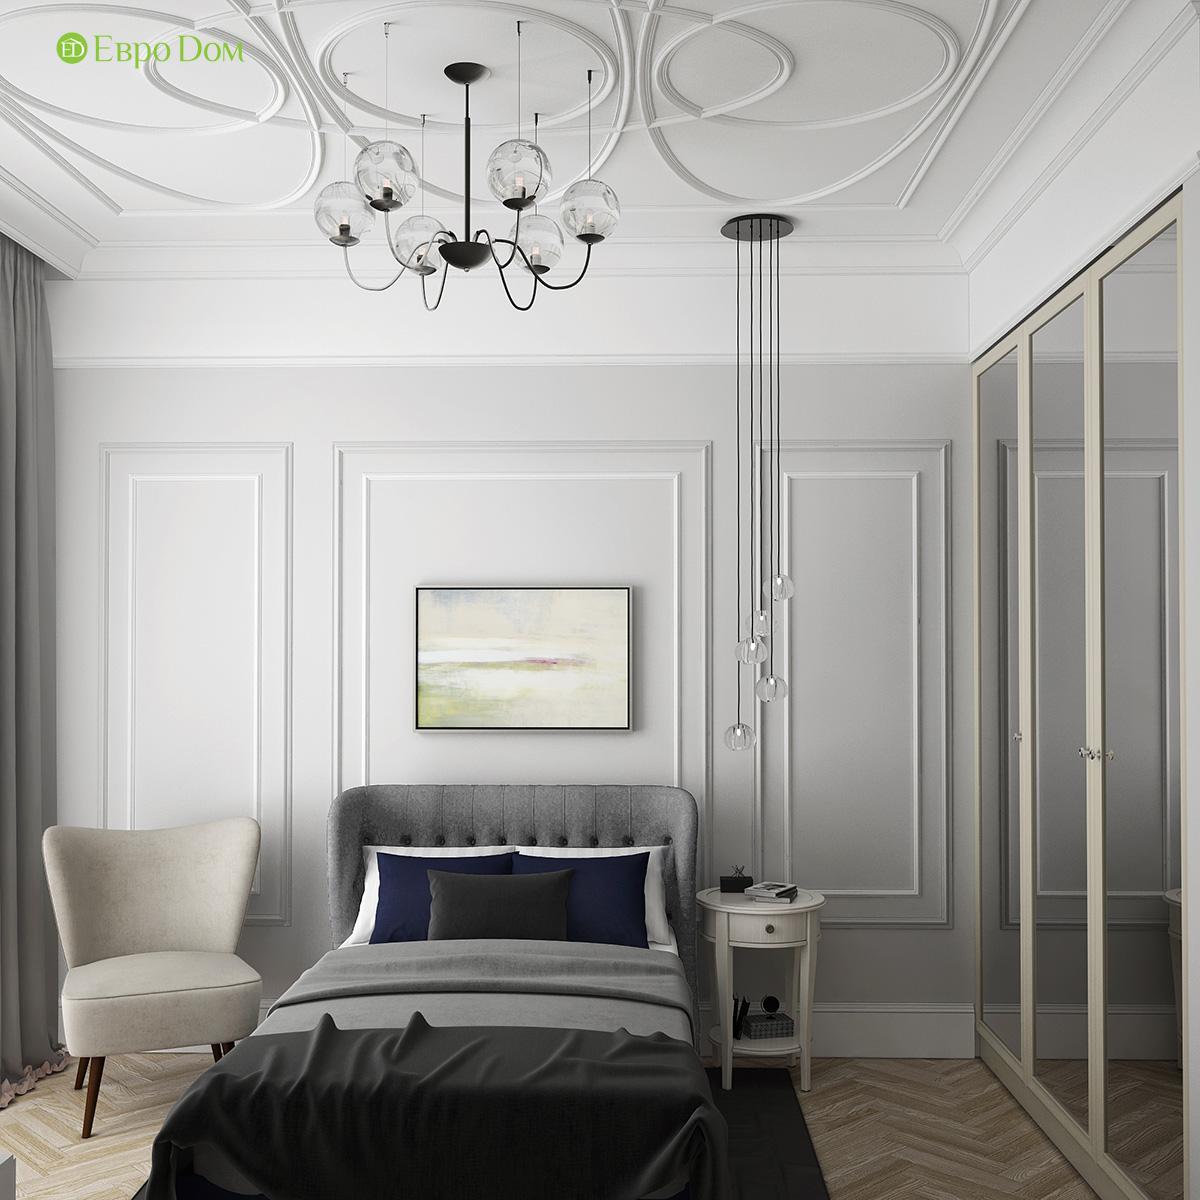 Дизайн трехкомнатной квартиры 82 кв. м в стиле неоклассика. Фото 010